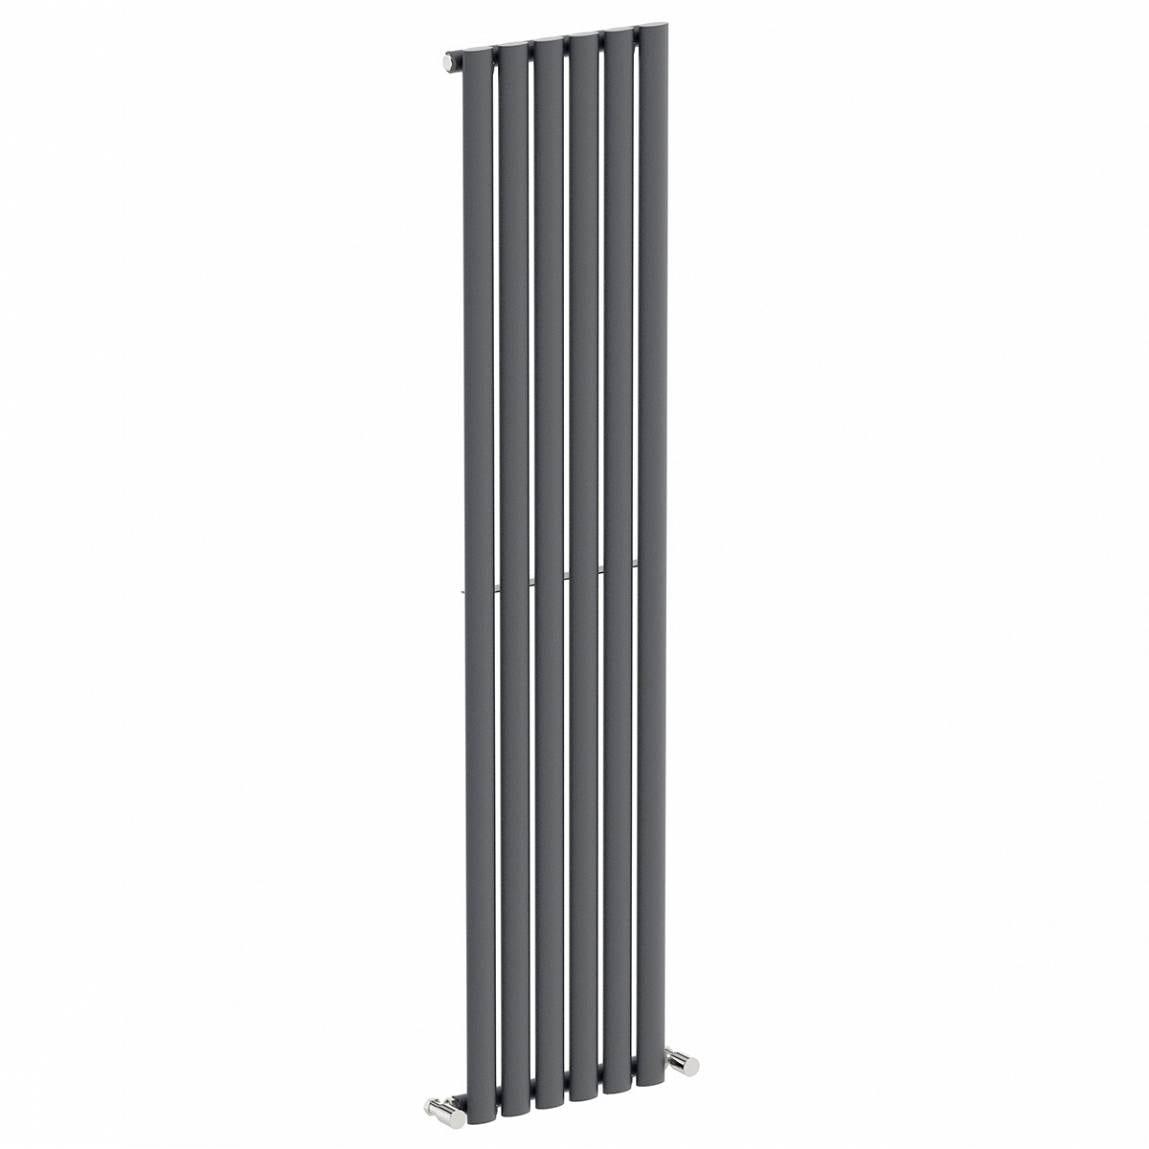 Mode Tate single vertical radiator 1600 x 360 offer pack